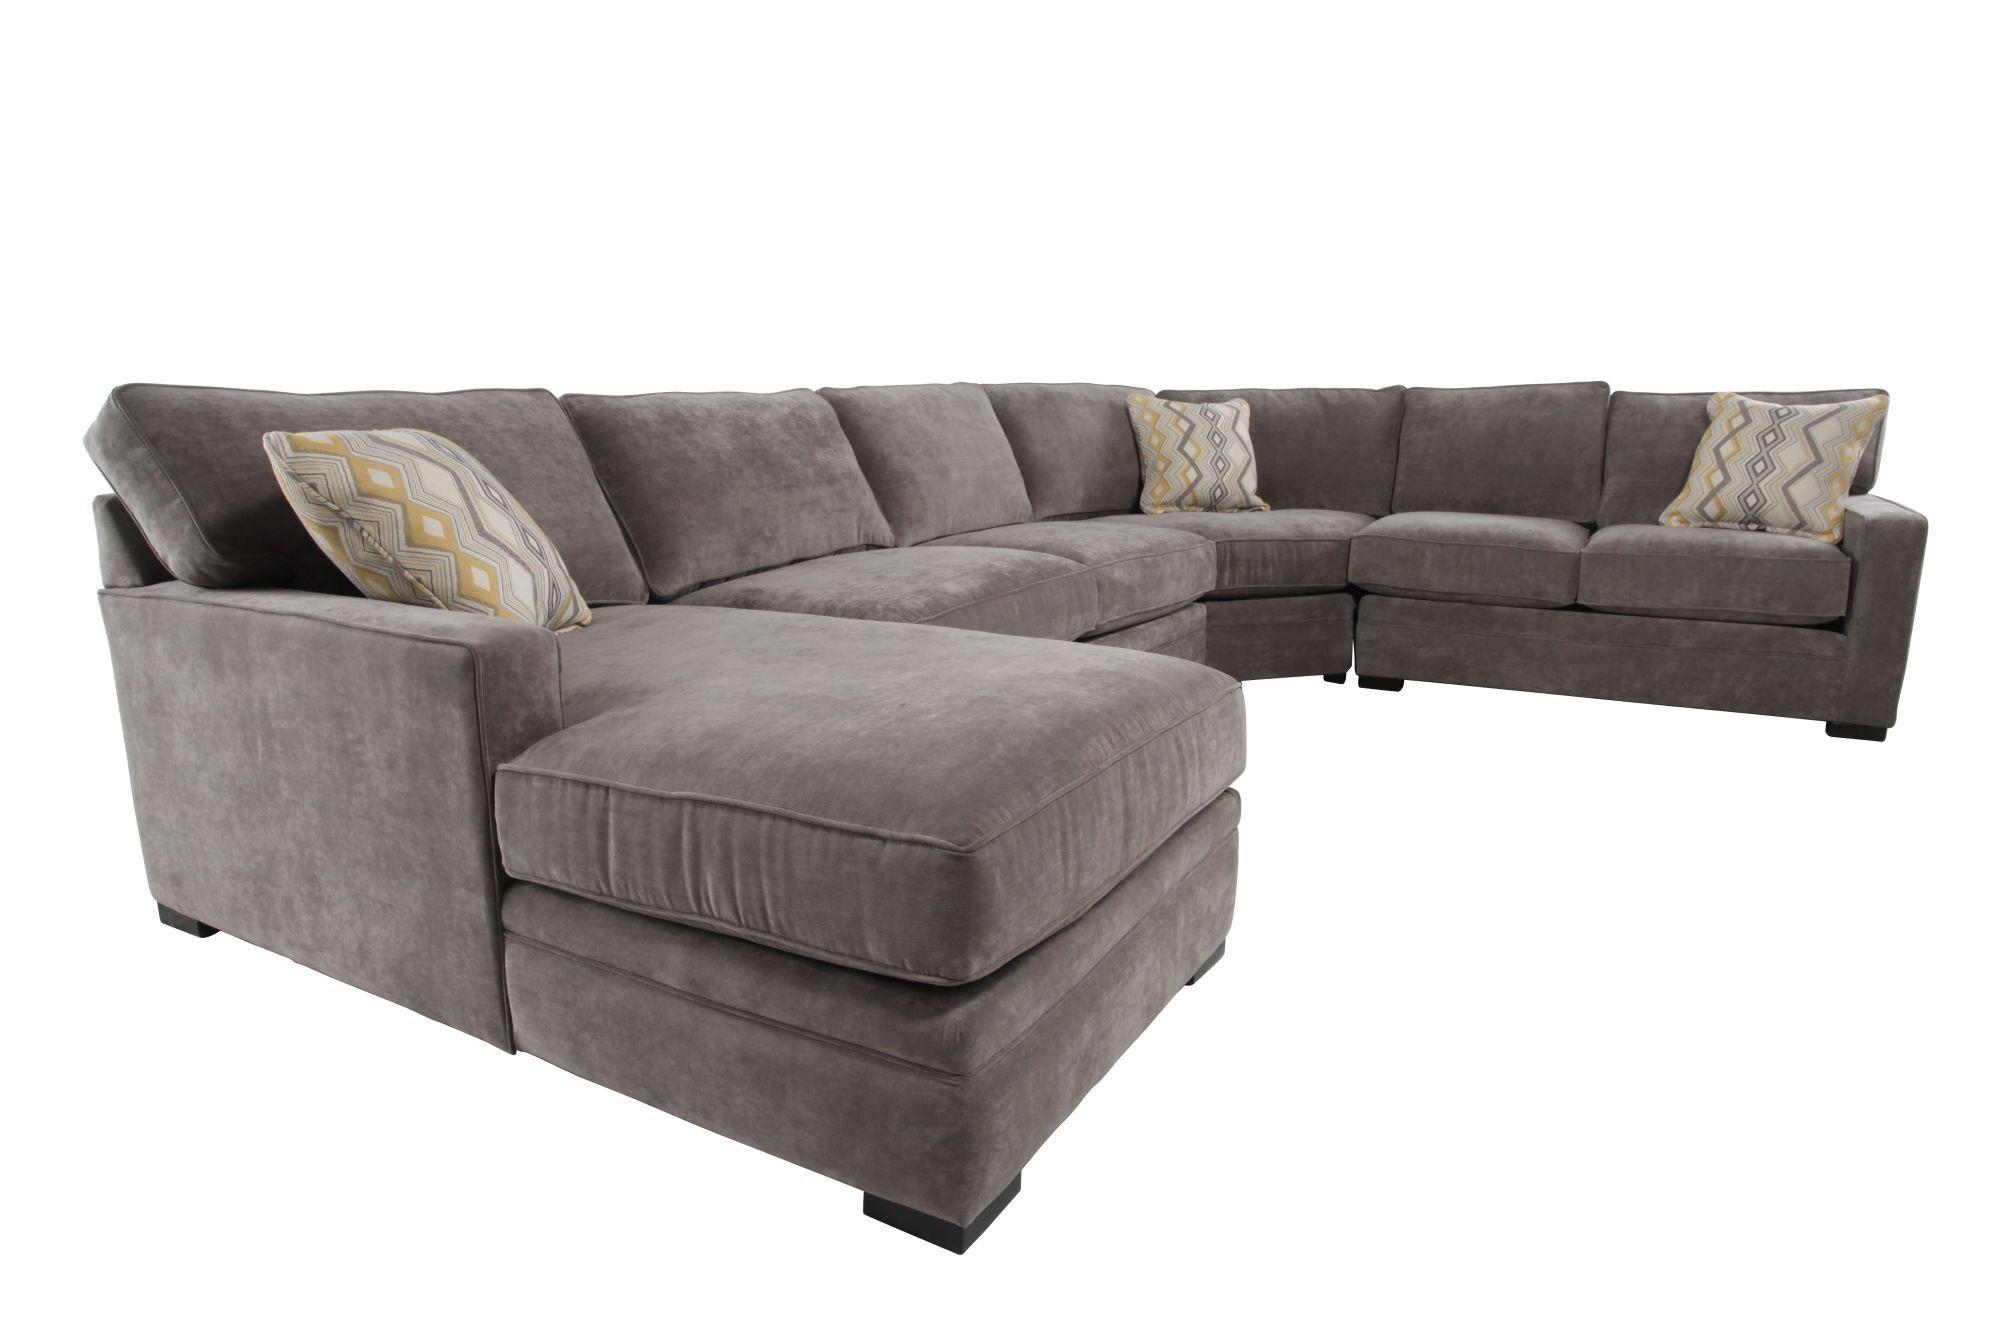 jonathan louis sofas ikea sofa reddit choices juno four piece sectional mathis